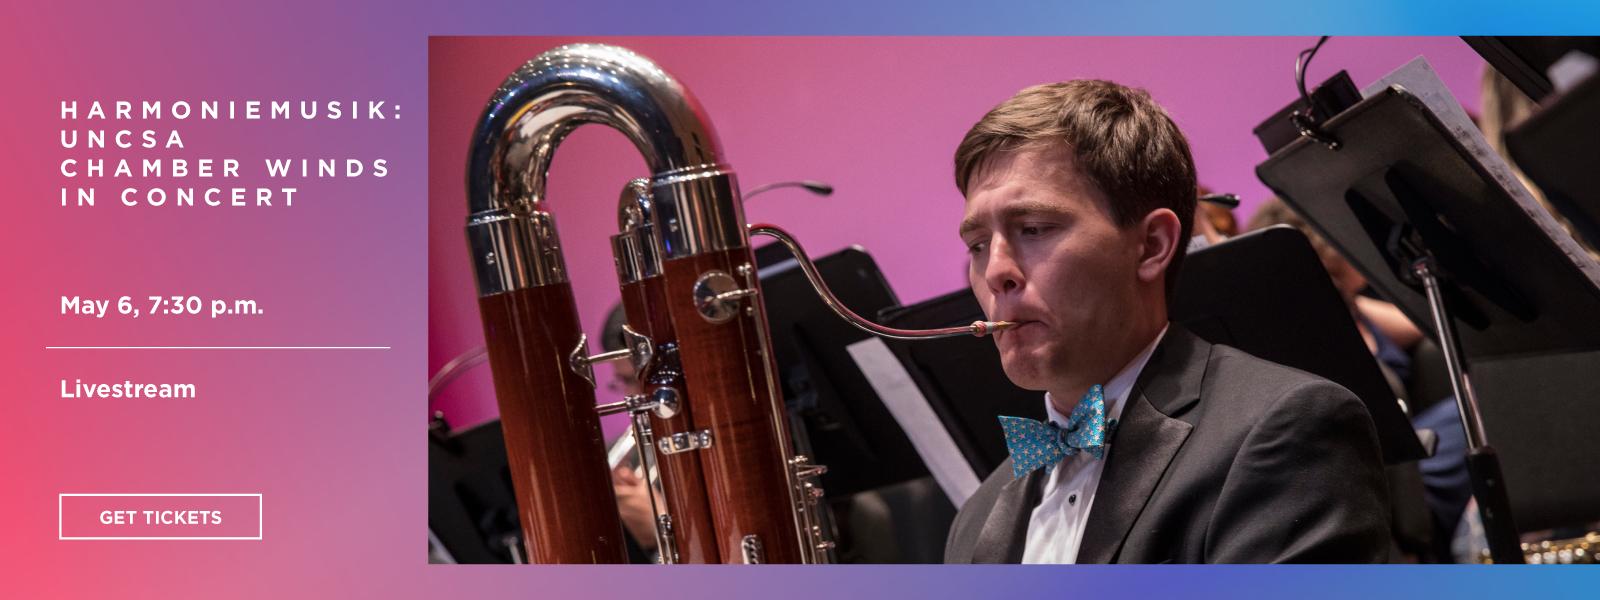 Harmoniemusik: UNCSA Chamber Winds in Concert - Livestream